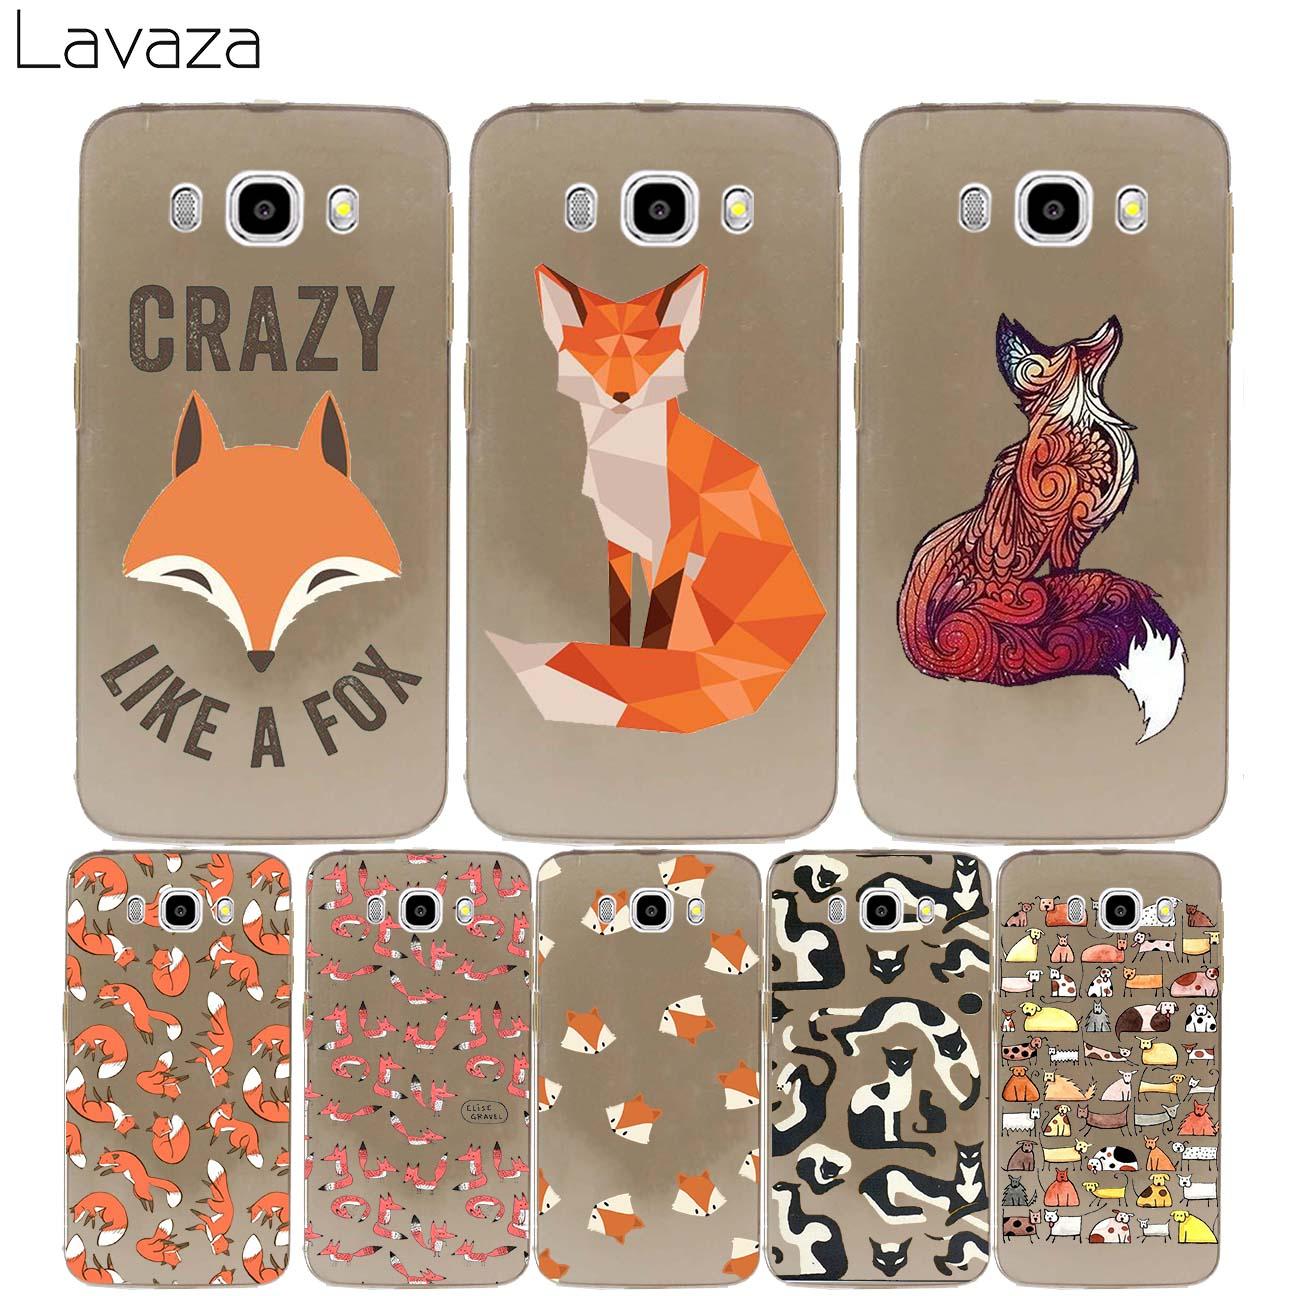 Lavaza sly fox Hard cover case for Samsung Galaxy J3 J5 J7 2017 J1 J2 2016 2015 Ace Pro Prime 2018